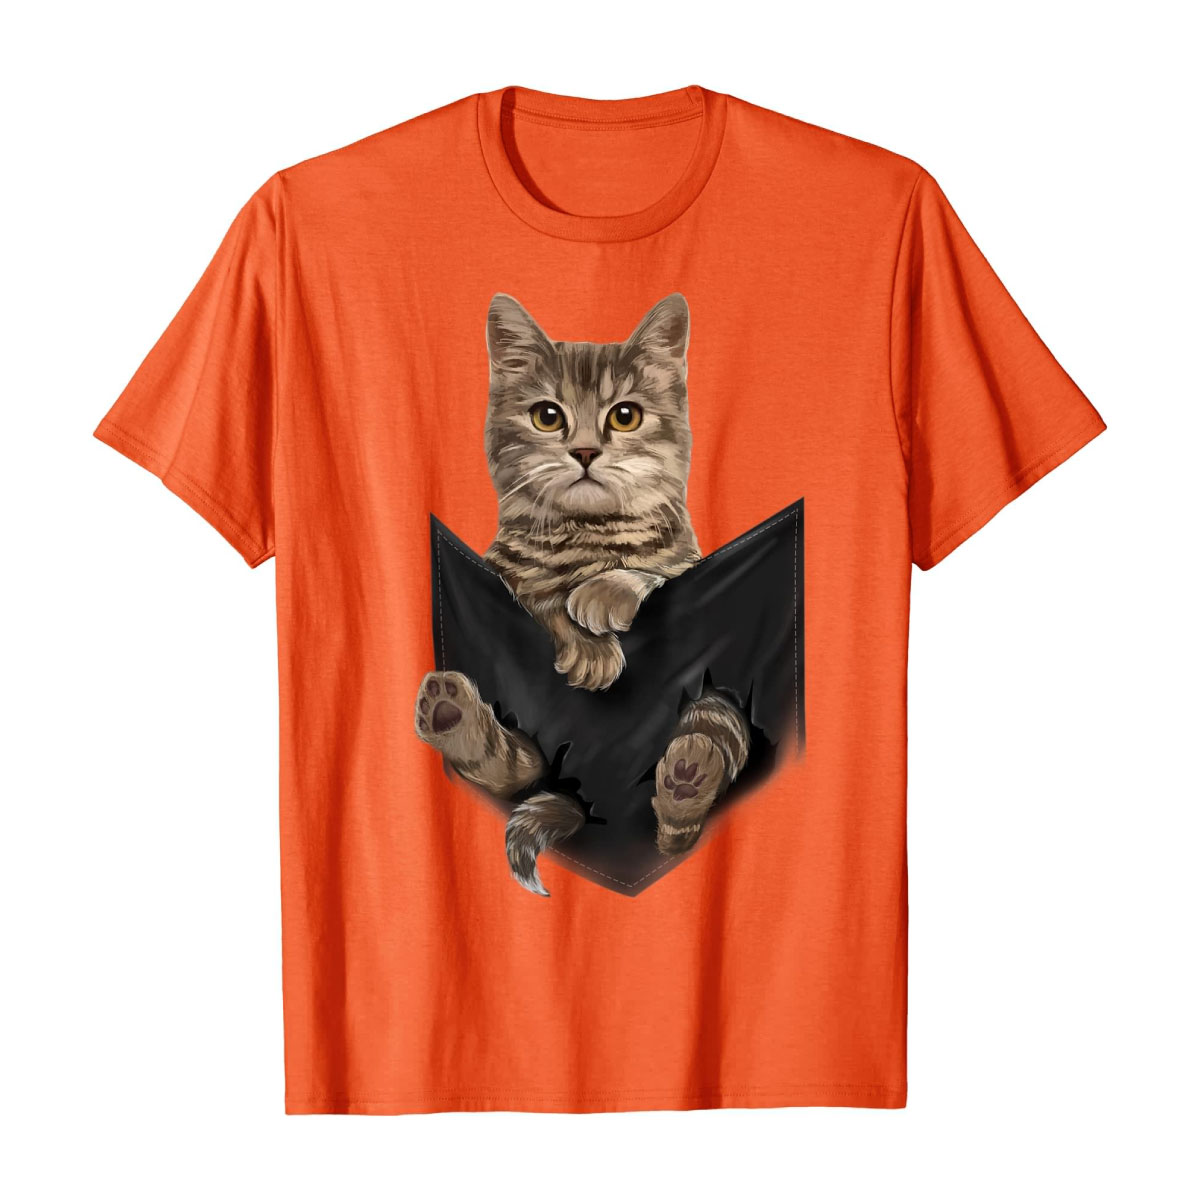 Graphic Tshirt Mens Cat Shirt